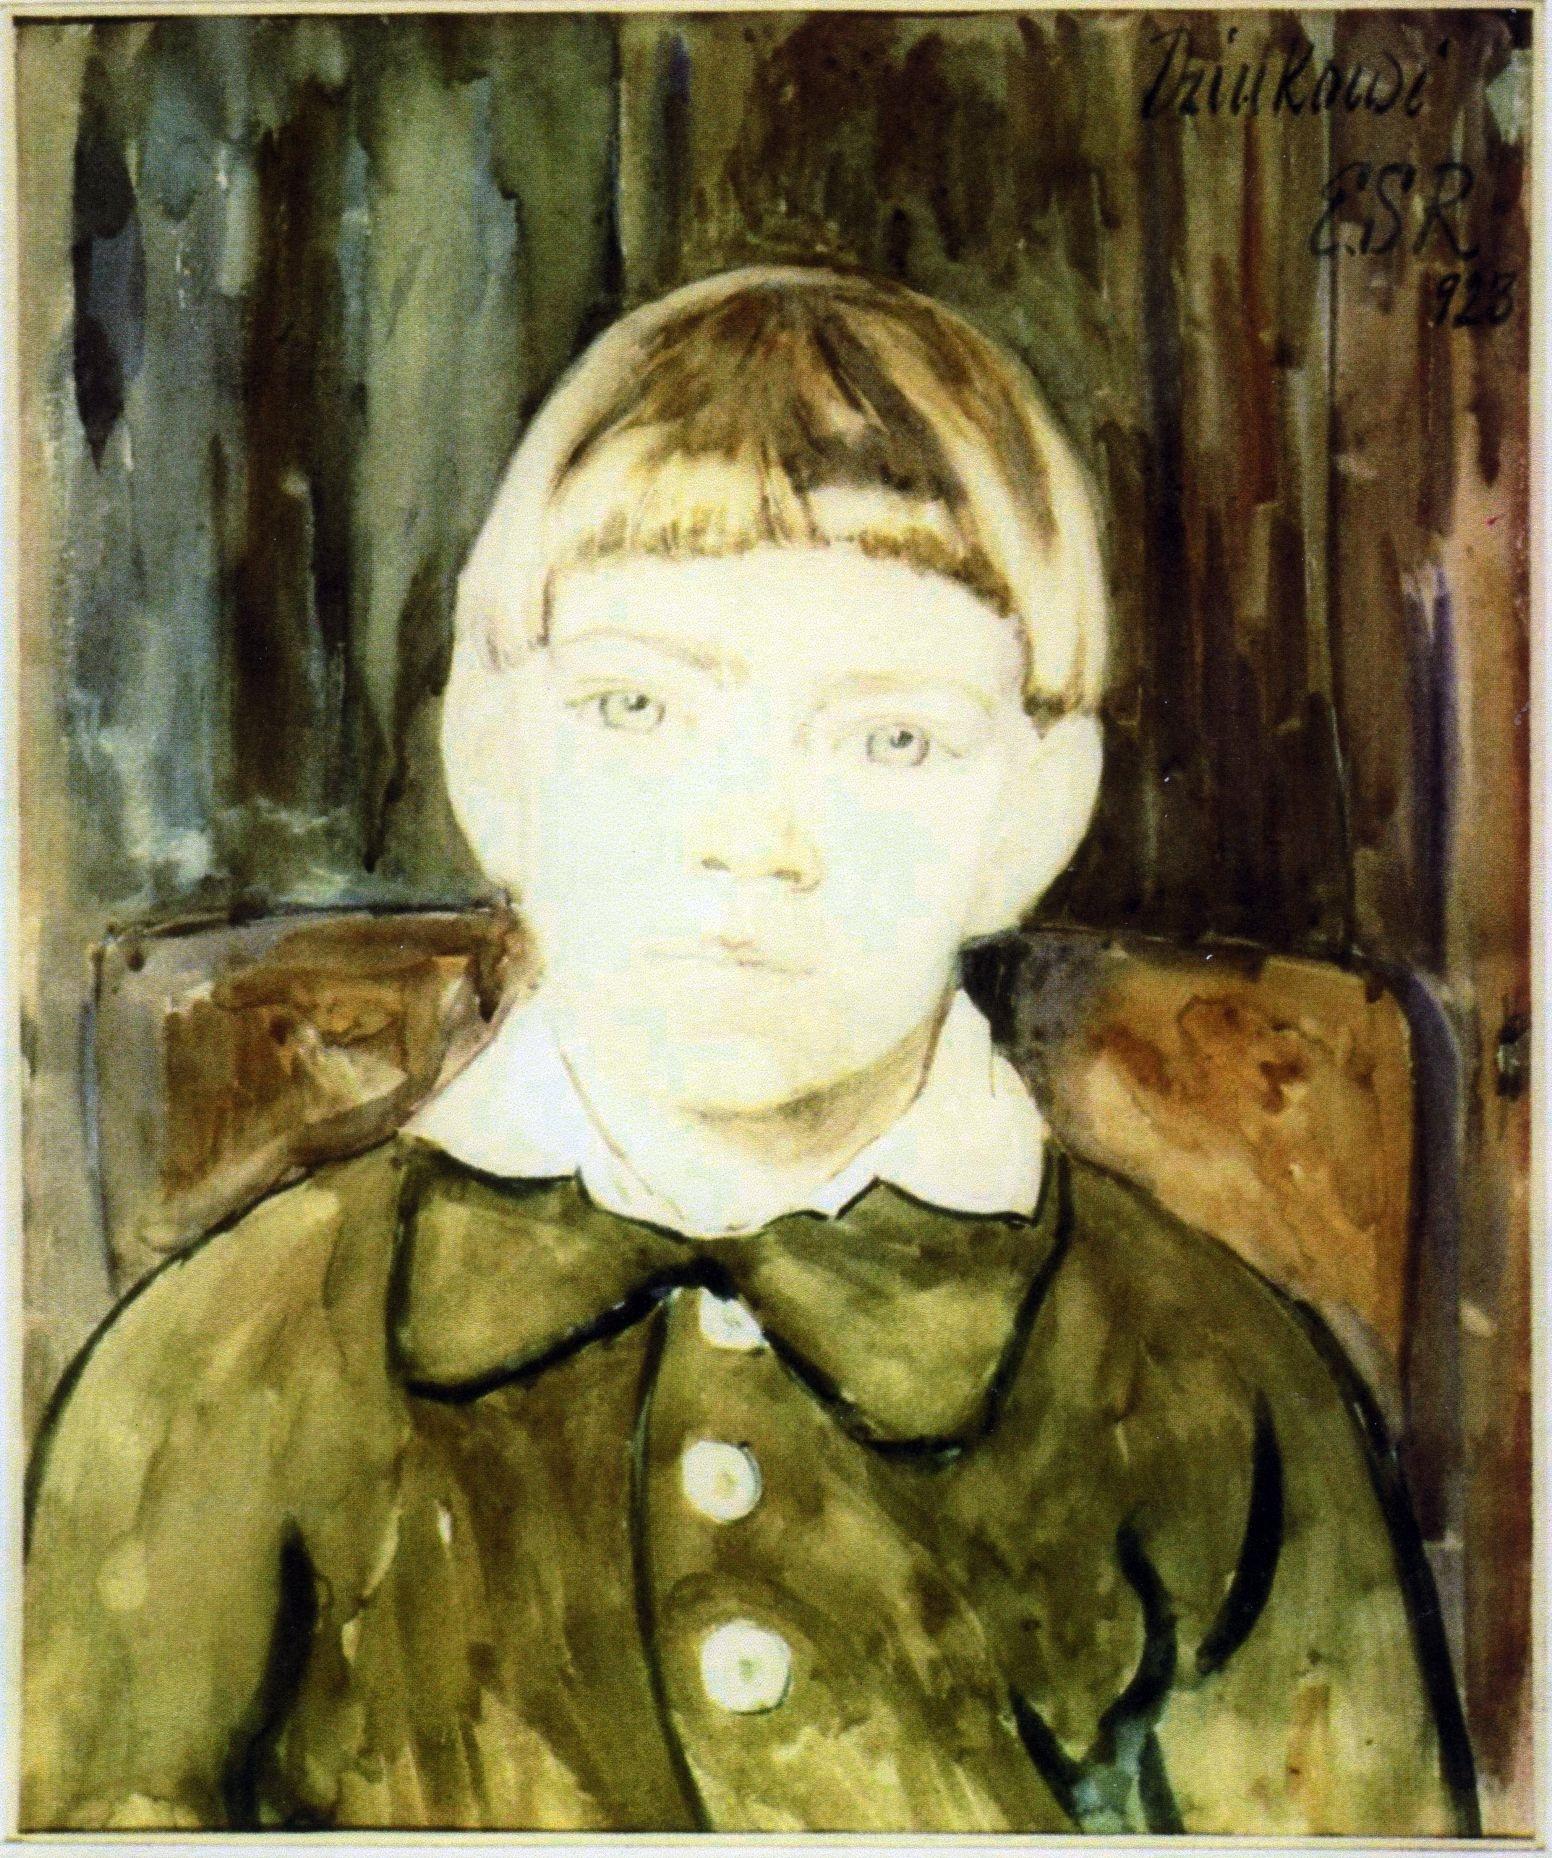 <div class='inner-box'><div class='close-desc'></div><span class='opis'>Andrzej Bobkowski - portret z 1923 roku. Akwarela</span><div class='clearfix'></div><span>Sygn. FIL05015</span><div class='clearfix'></div><span>&copy; Instytut Literacki</span></div>